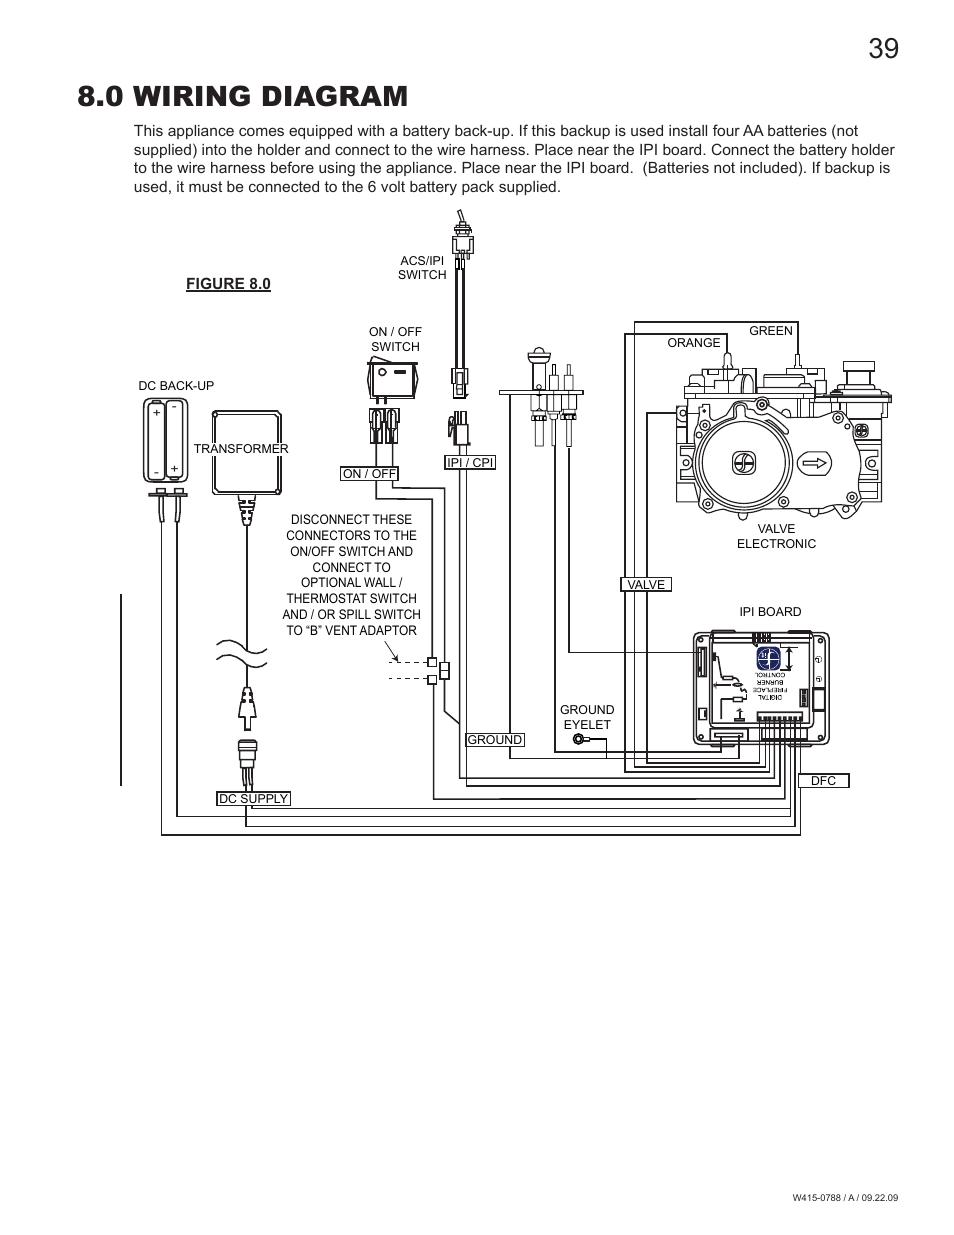 vrcd400 sdu wiring diagram bass guitar 2 pickups outboard motor trim tab adjustment - impremedia.net